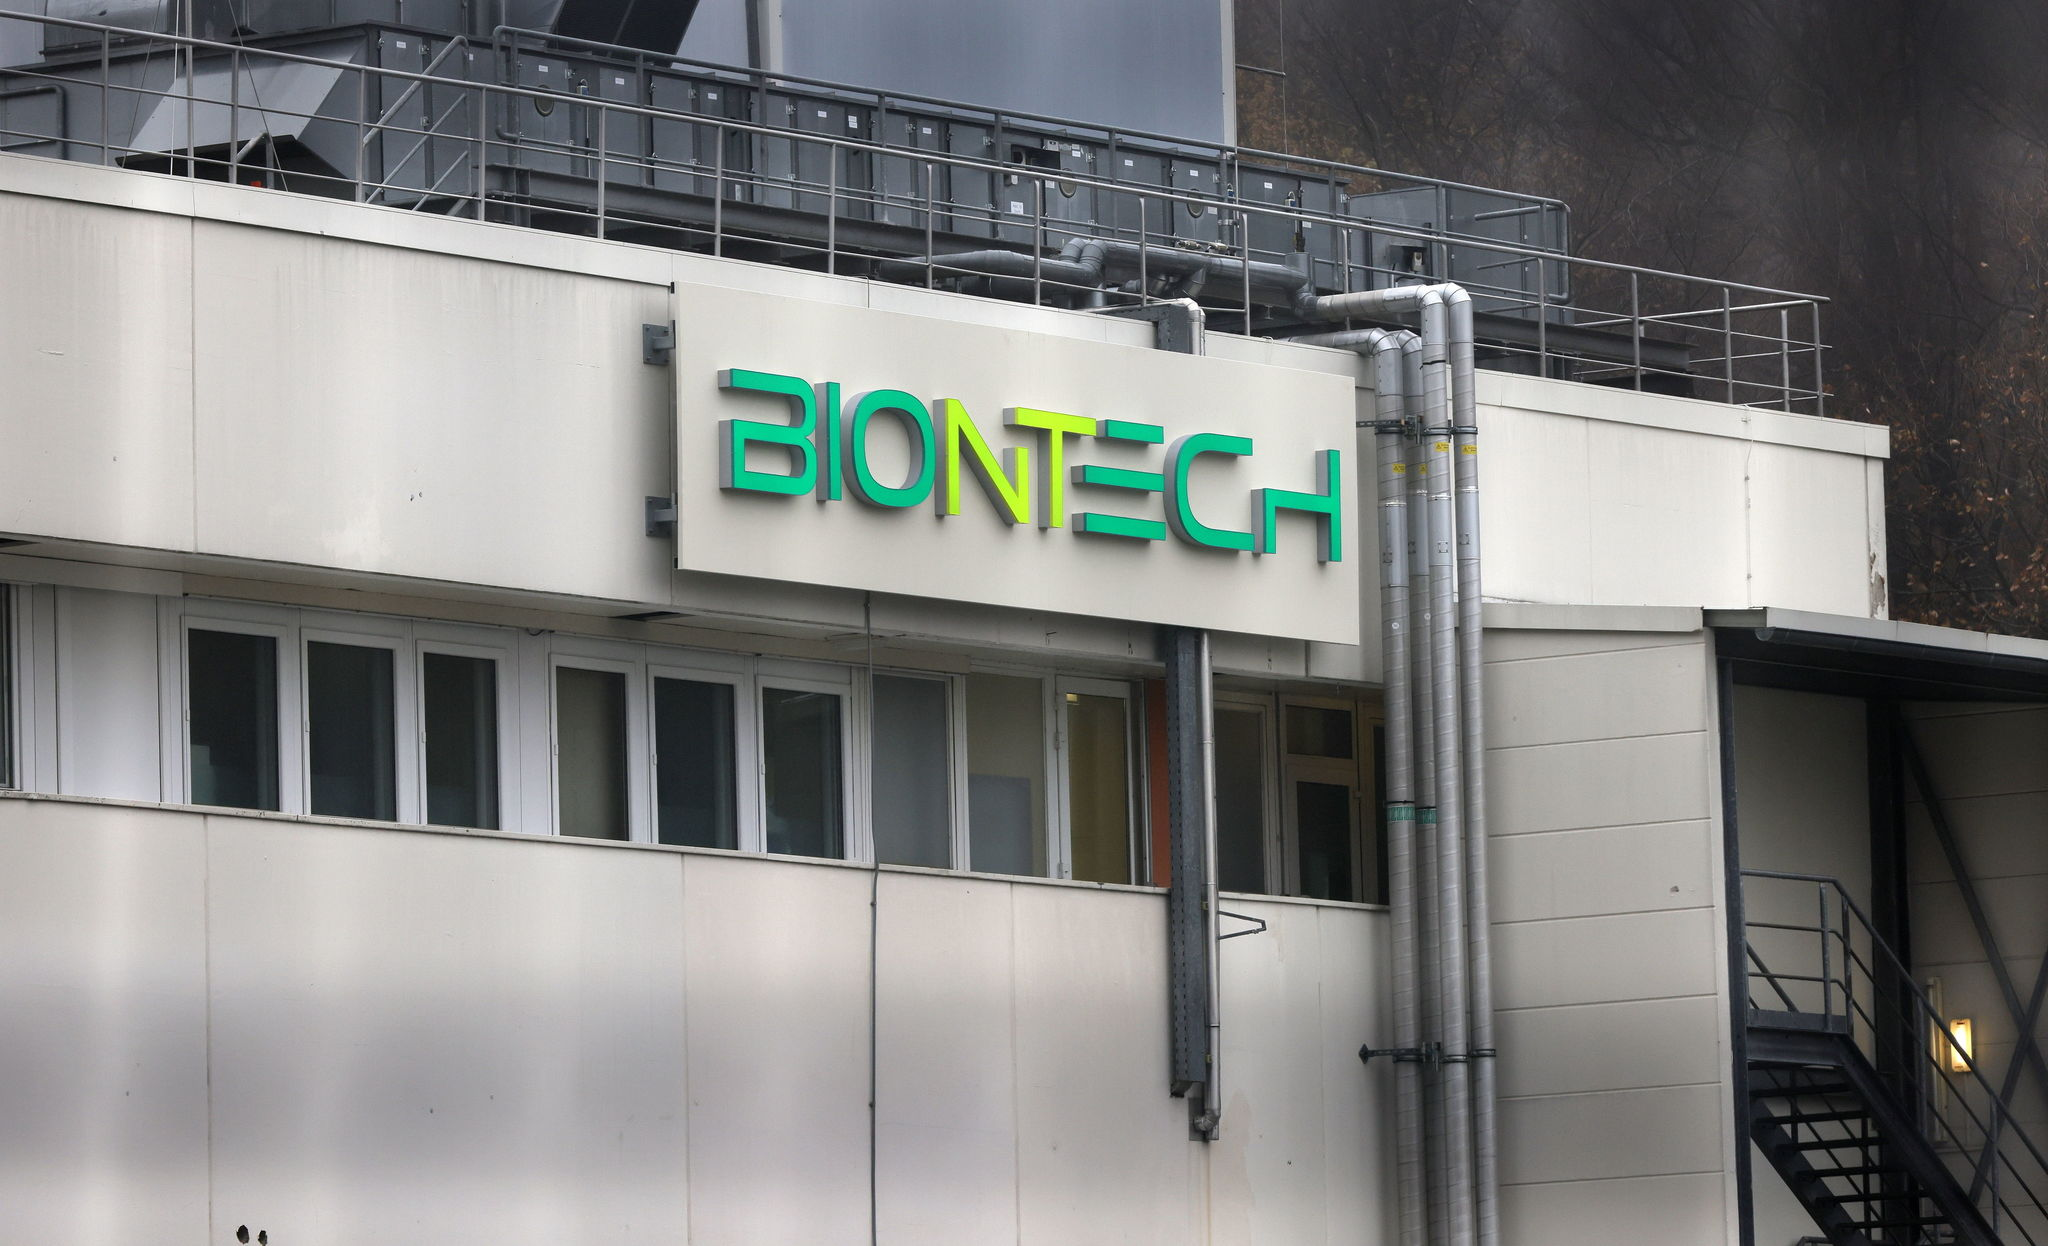 Bionteck